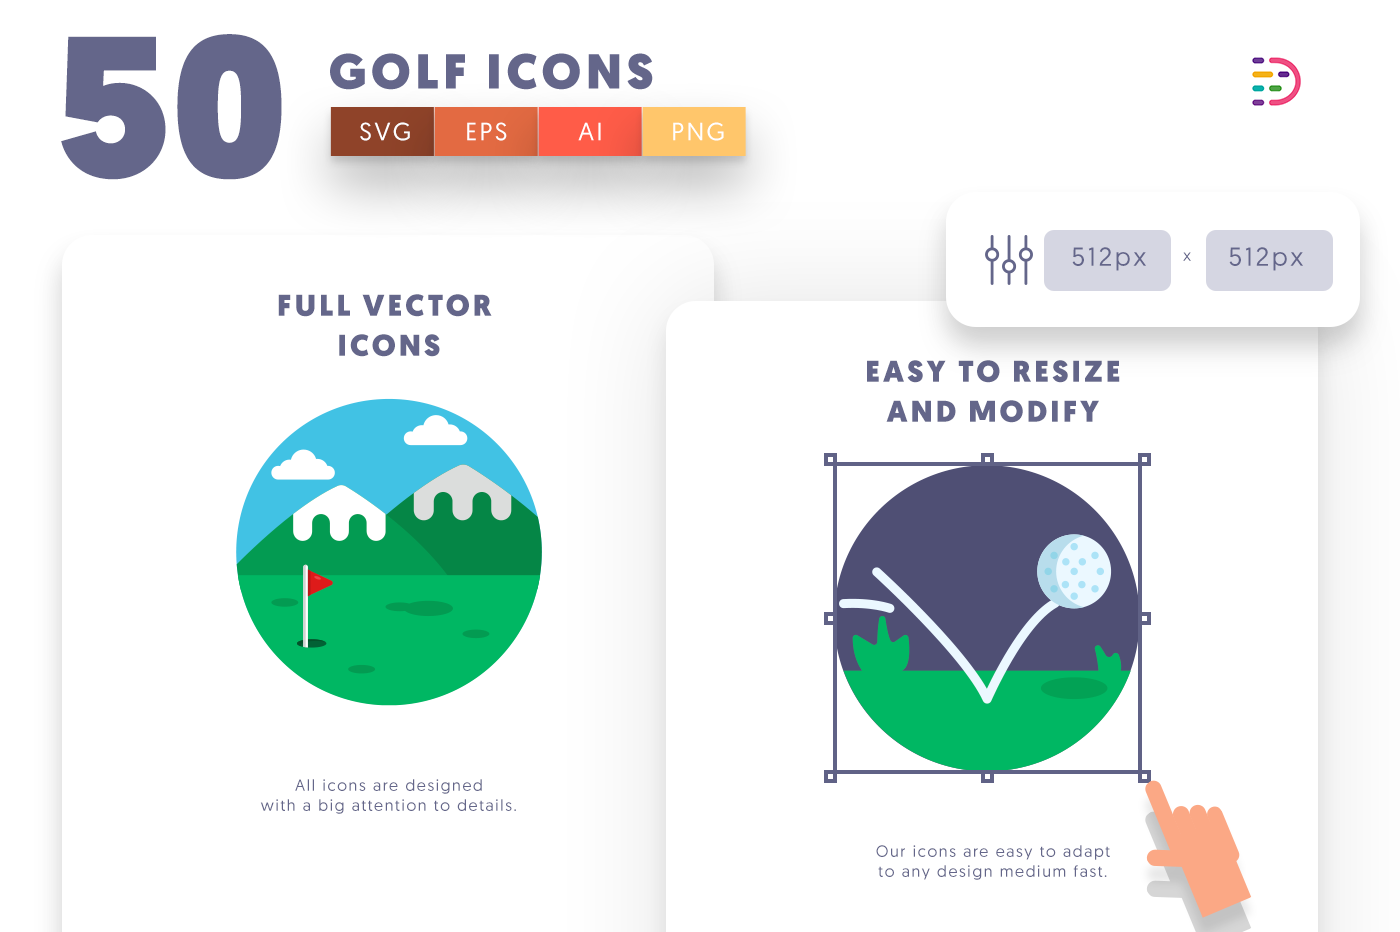 Full vector 50Golf Icons